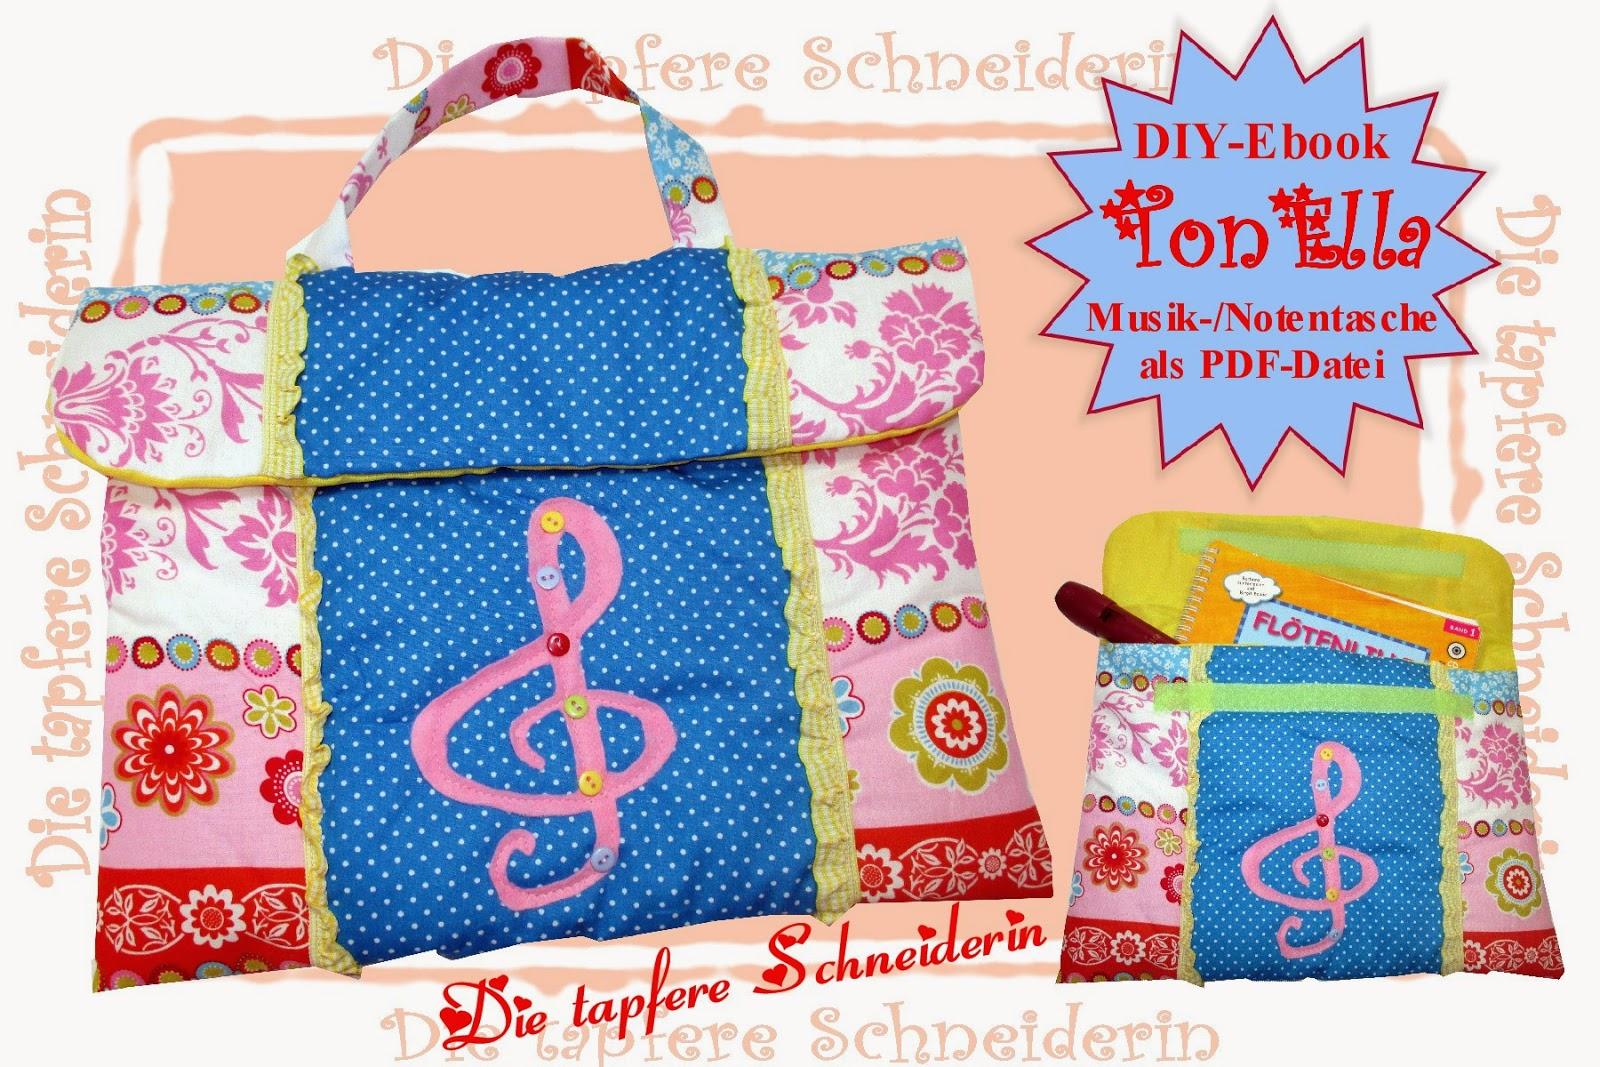 http://de.dawanda.com/product/68916823-E-Book-Naehanleitung-Tonella-Musik-Notentasche